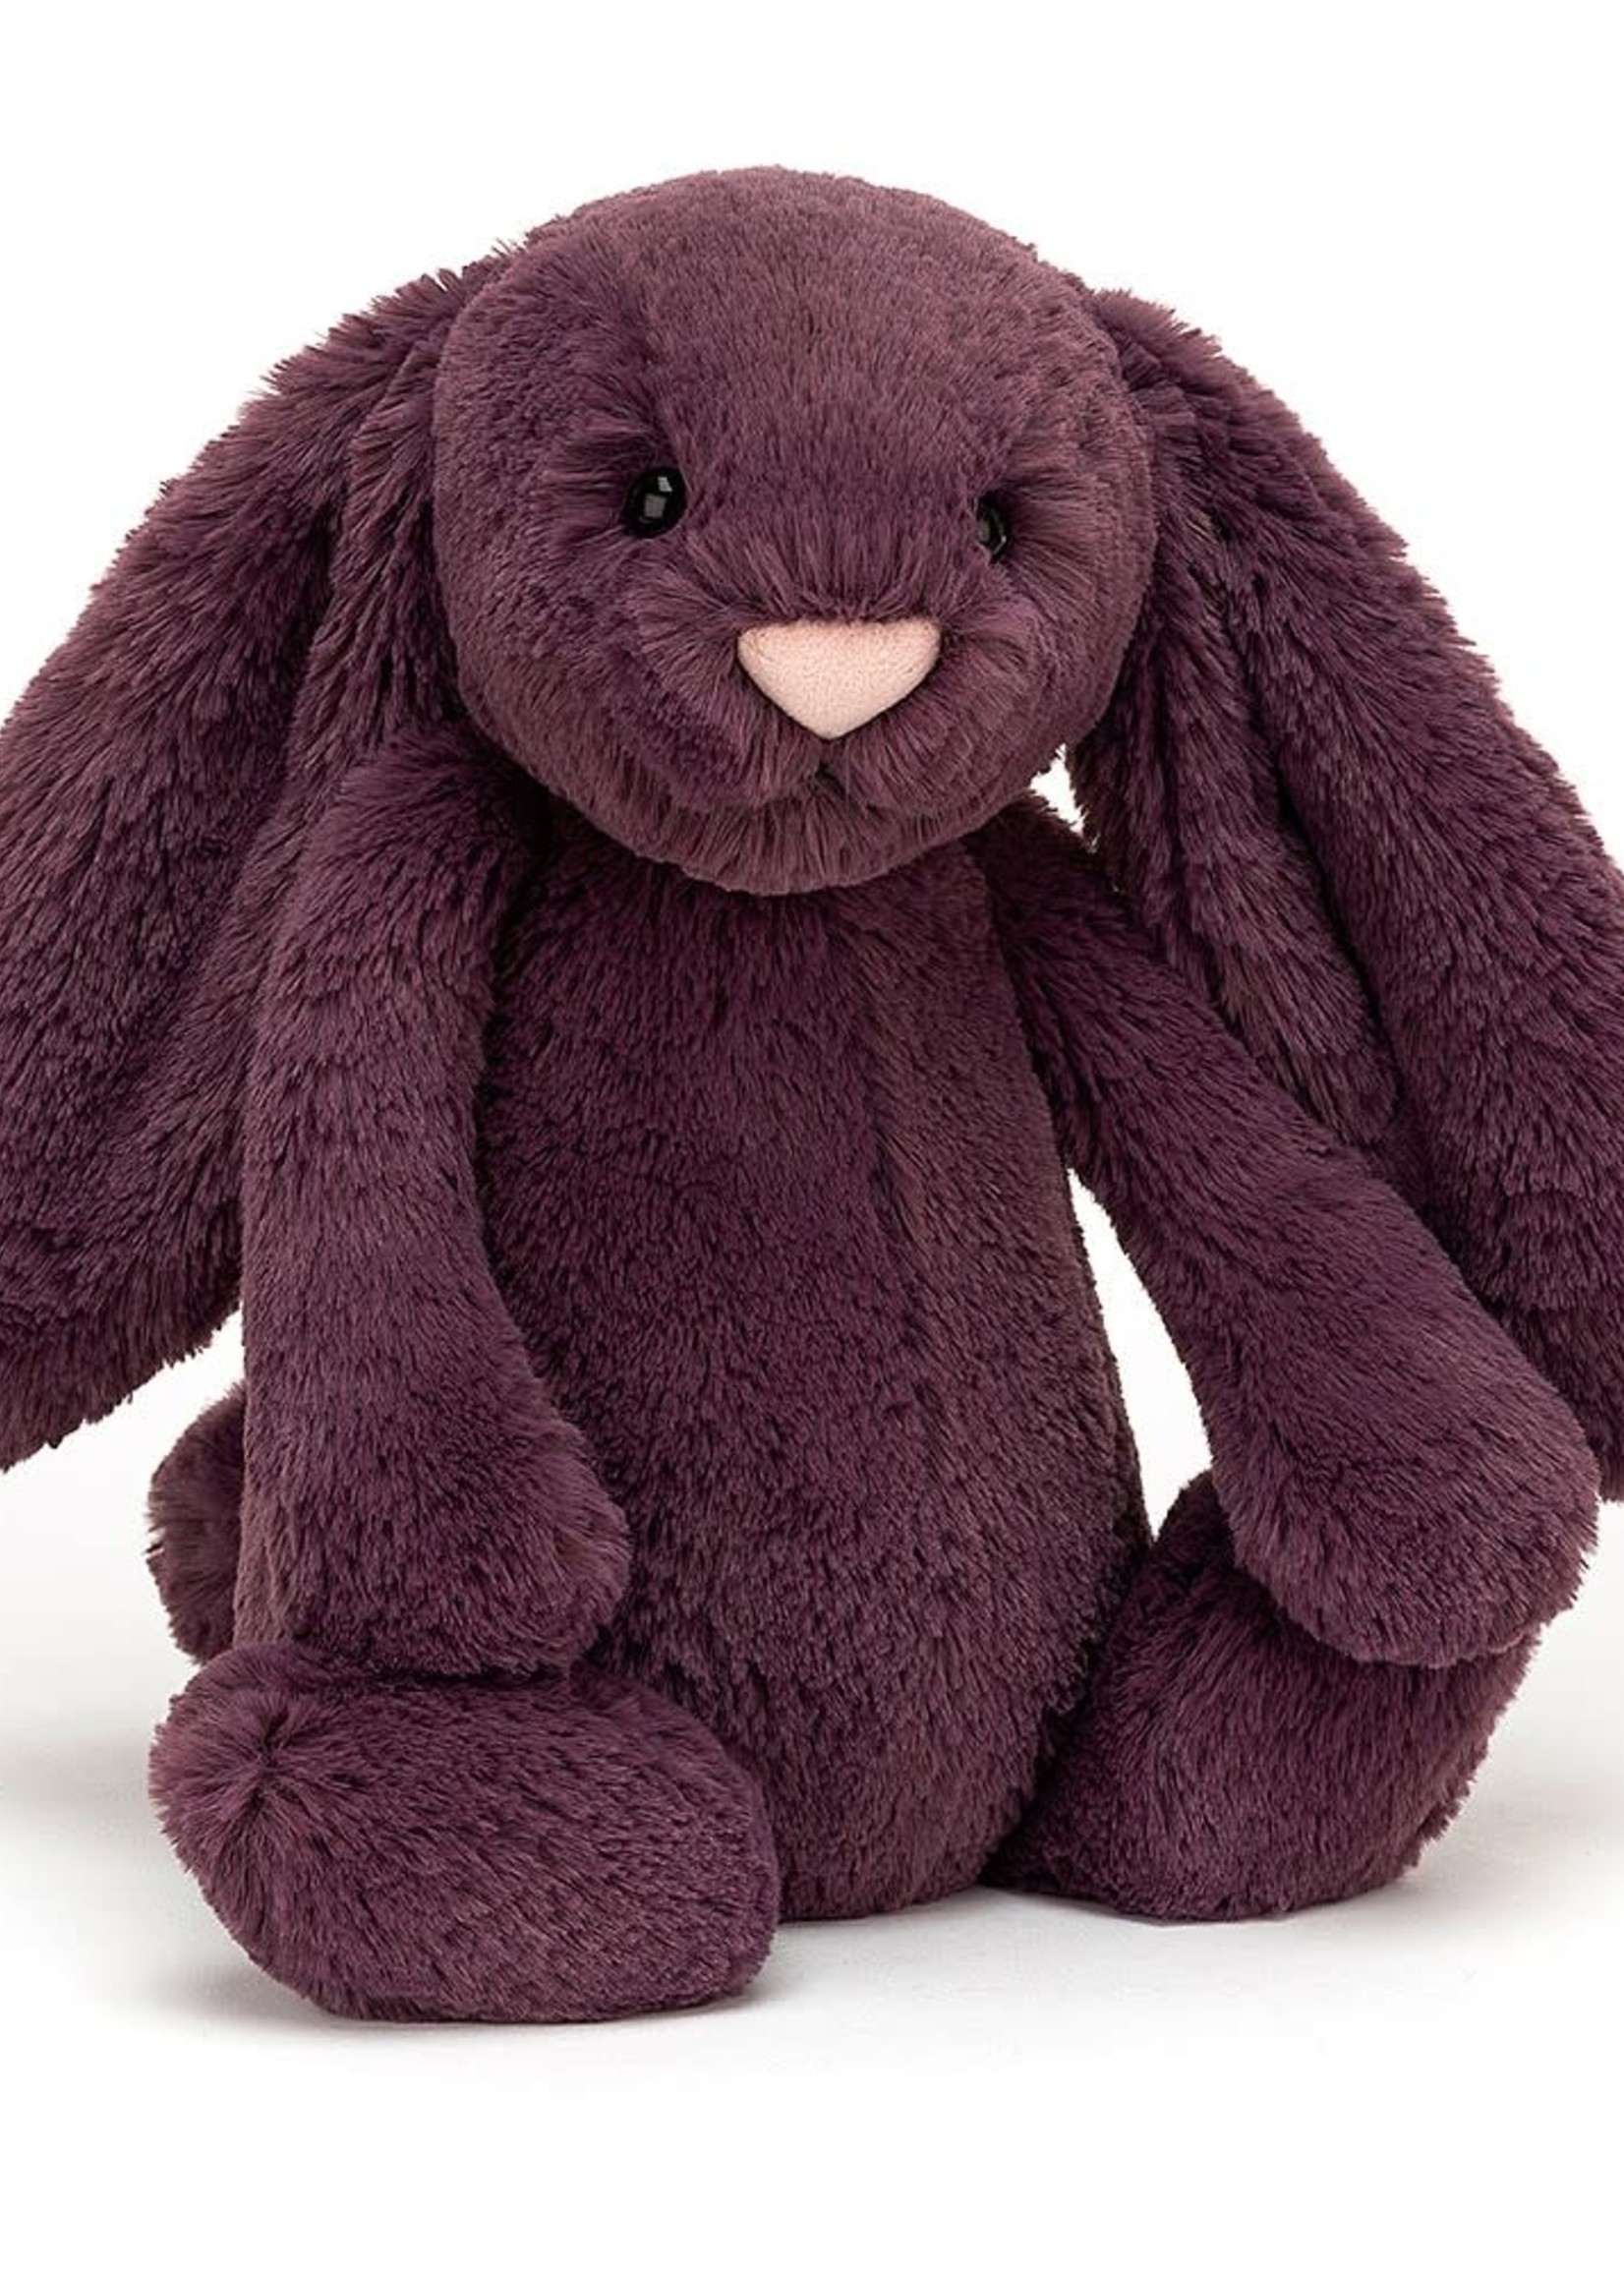 Jellycat Bashful Plum Bunny Huge